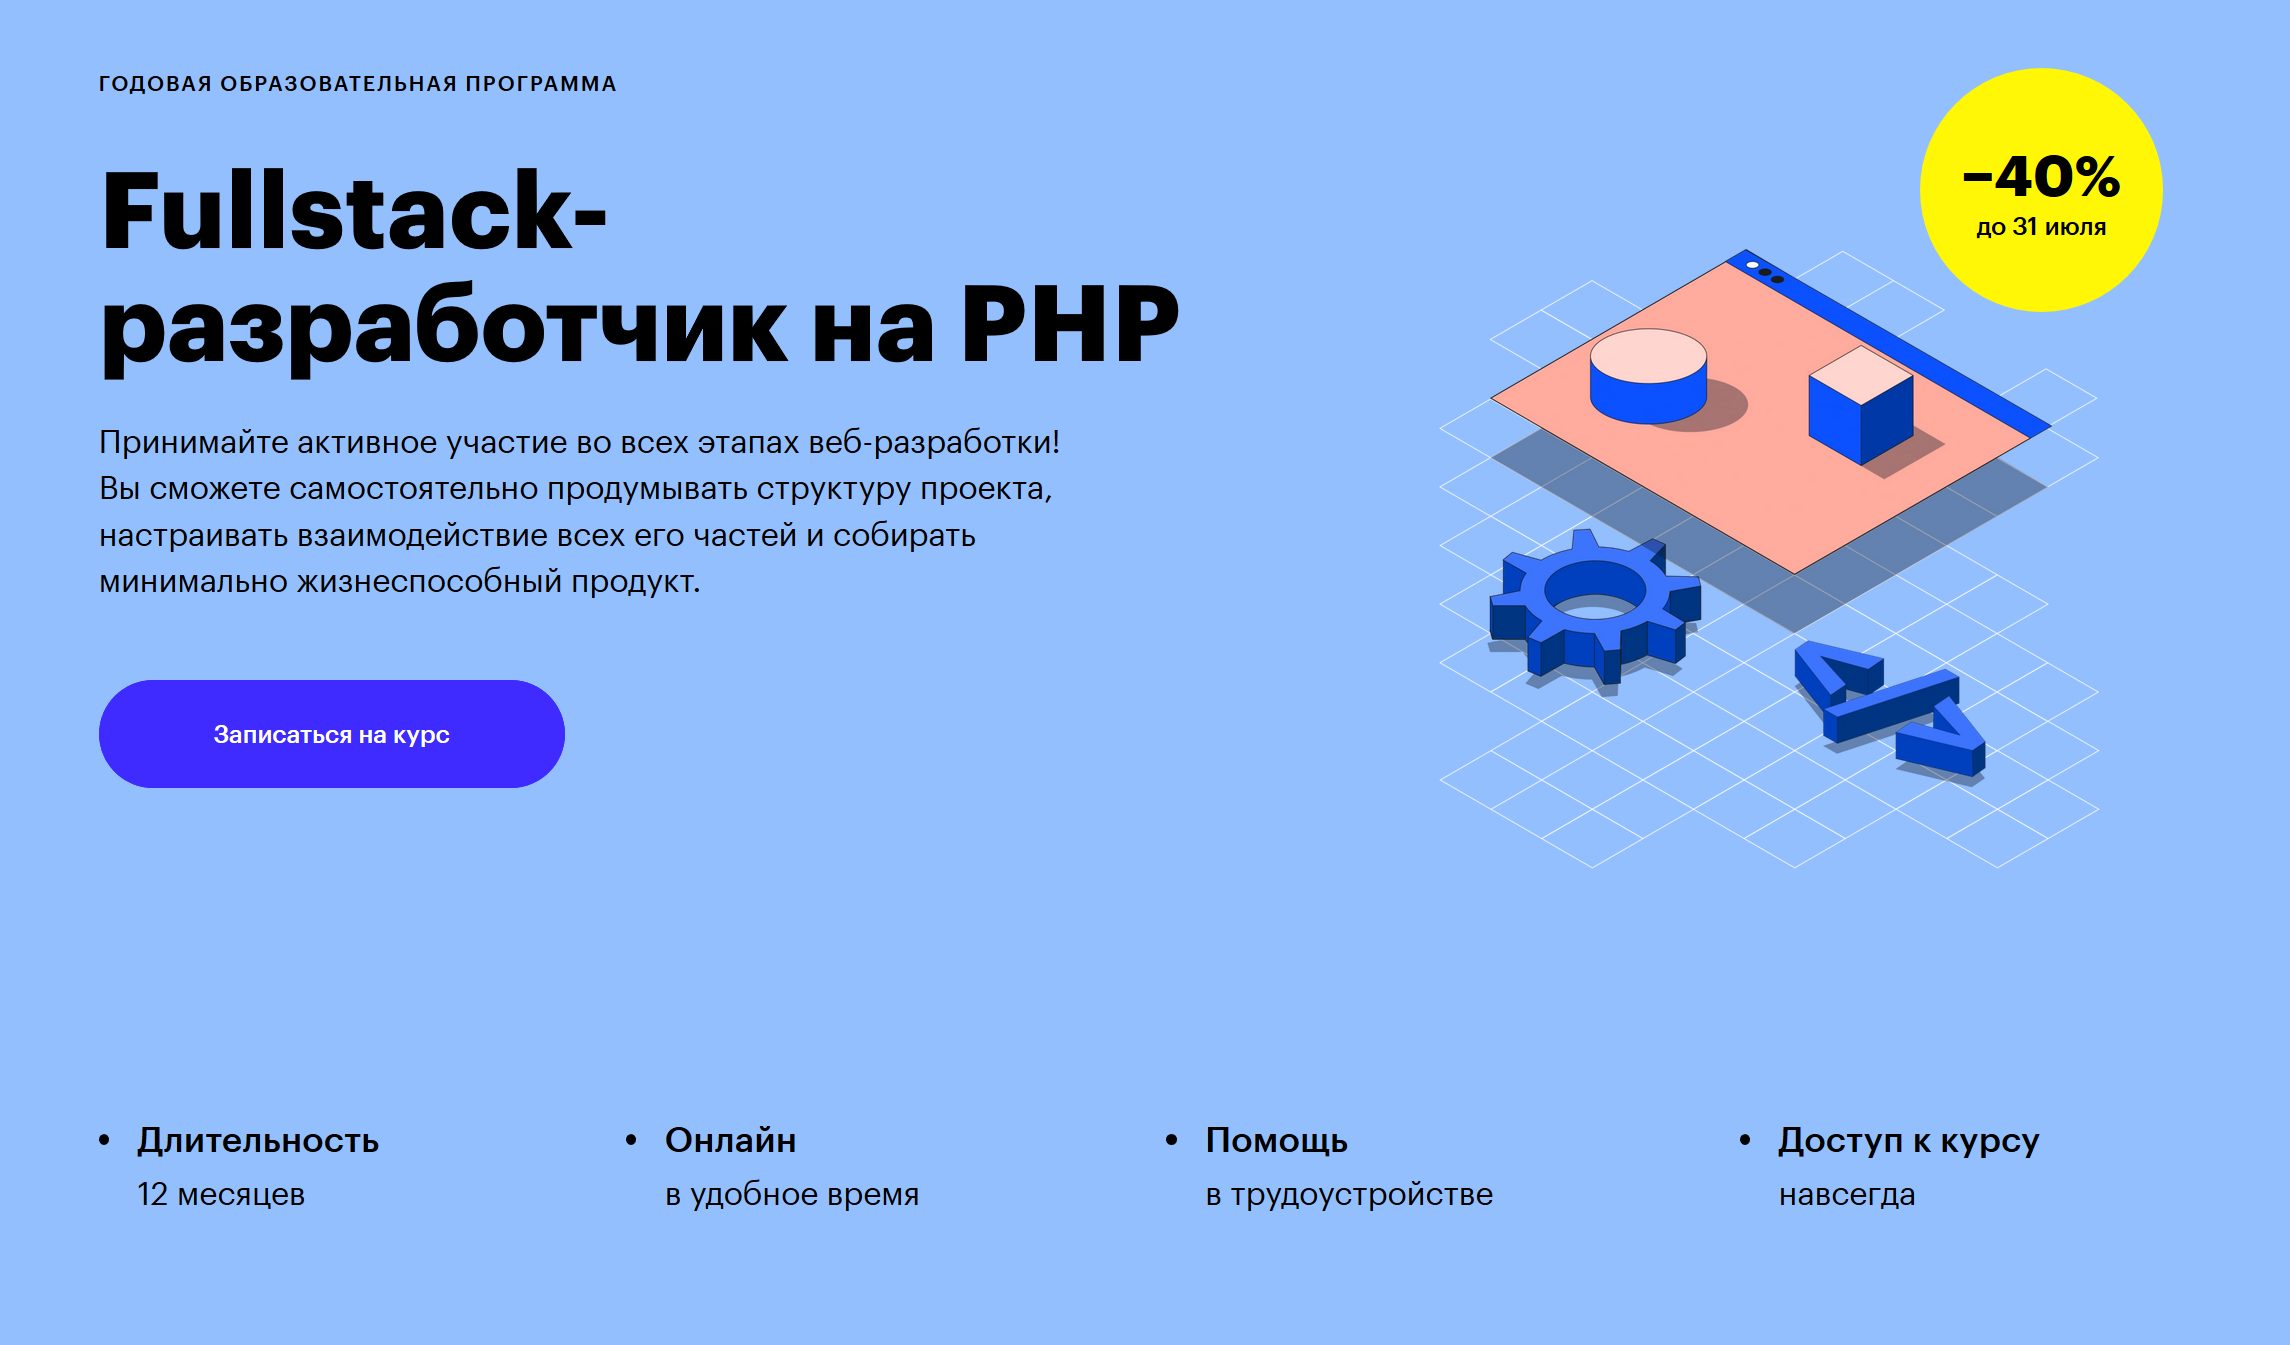 Fullstack-разработчик на PHP